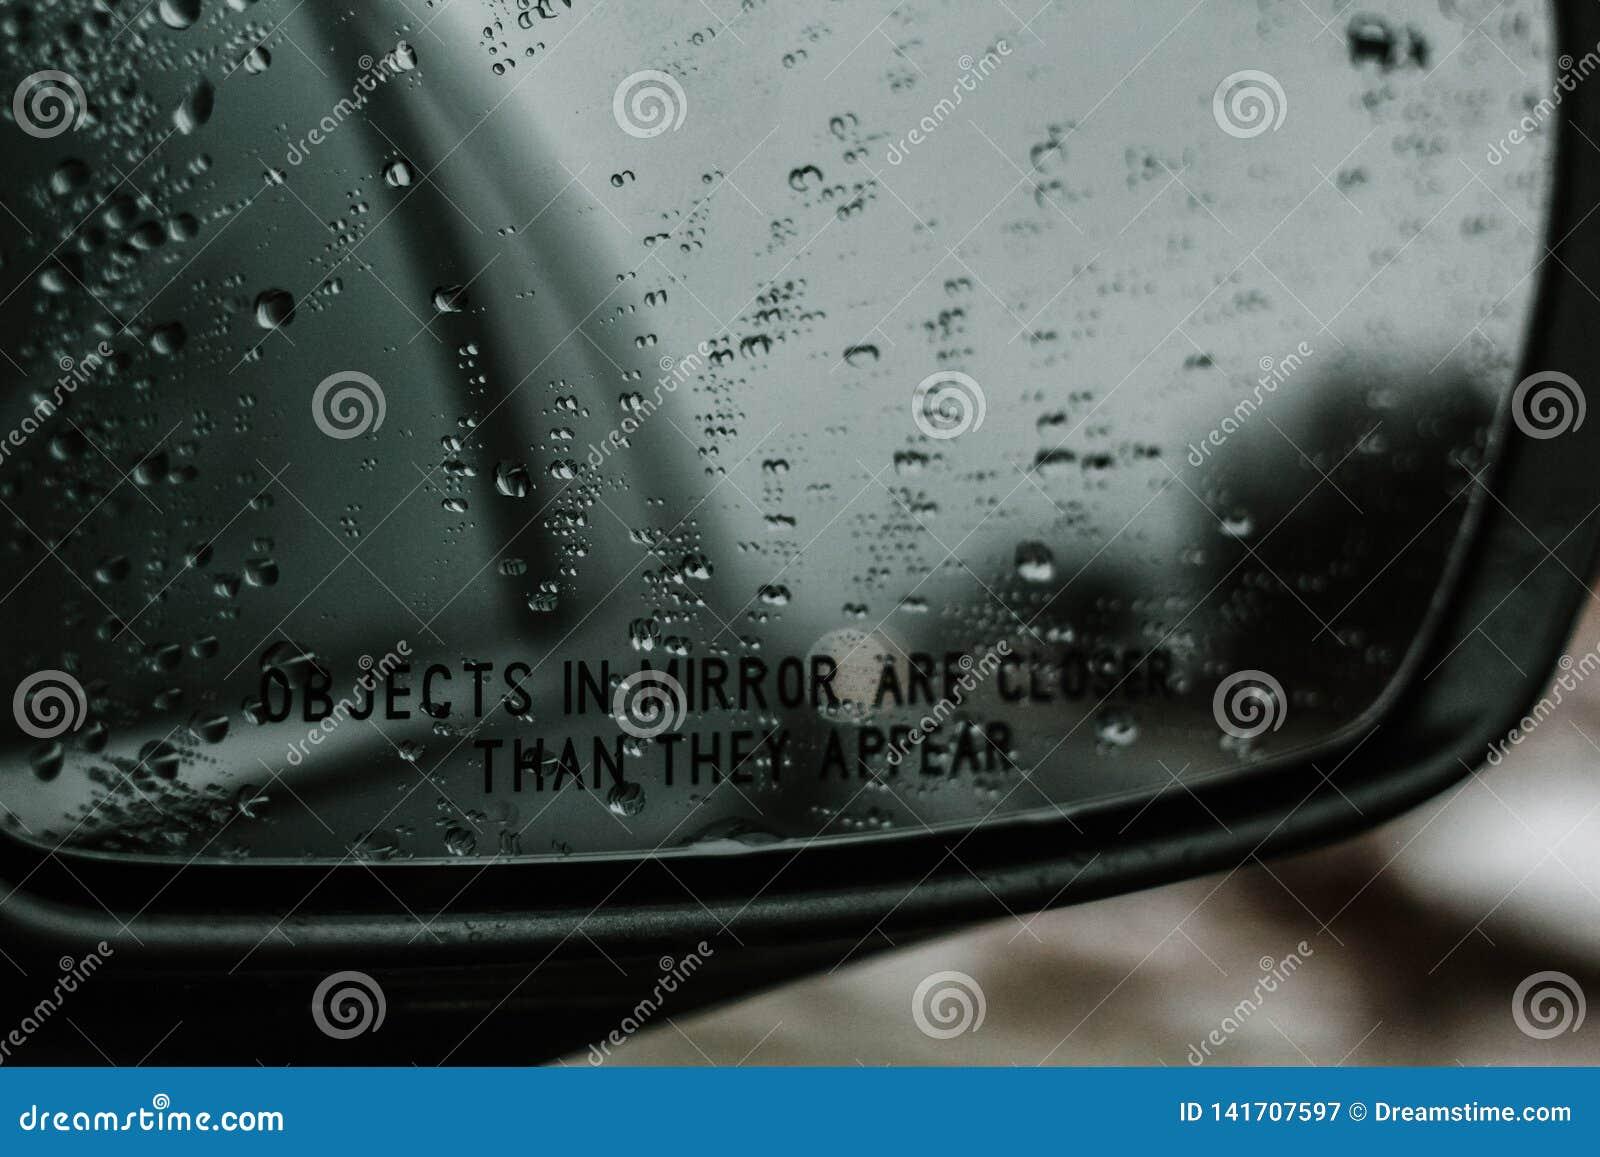 Raindrop on my rear view mirror